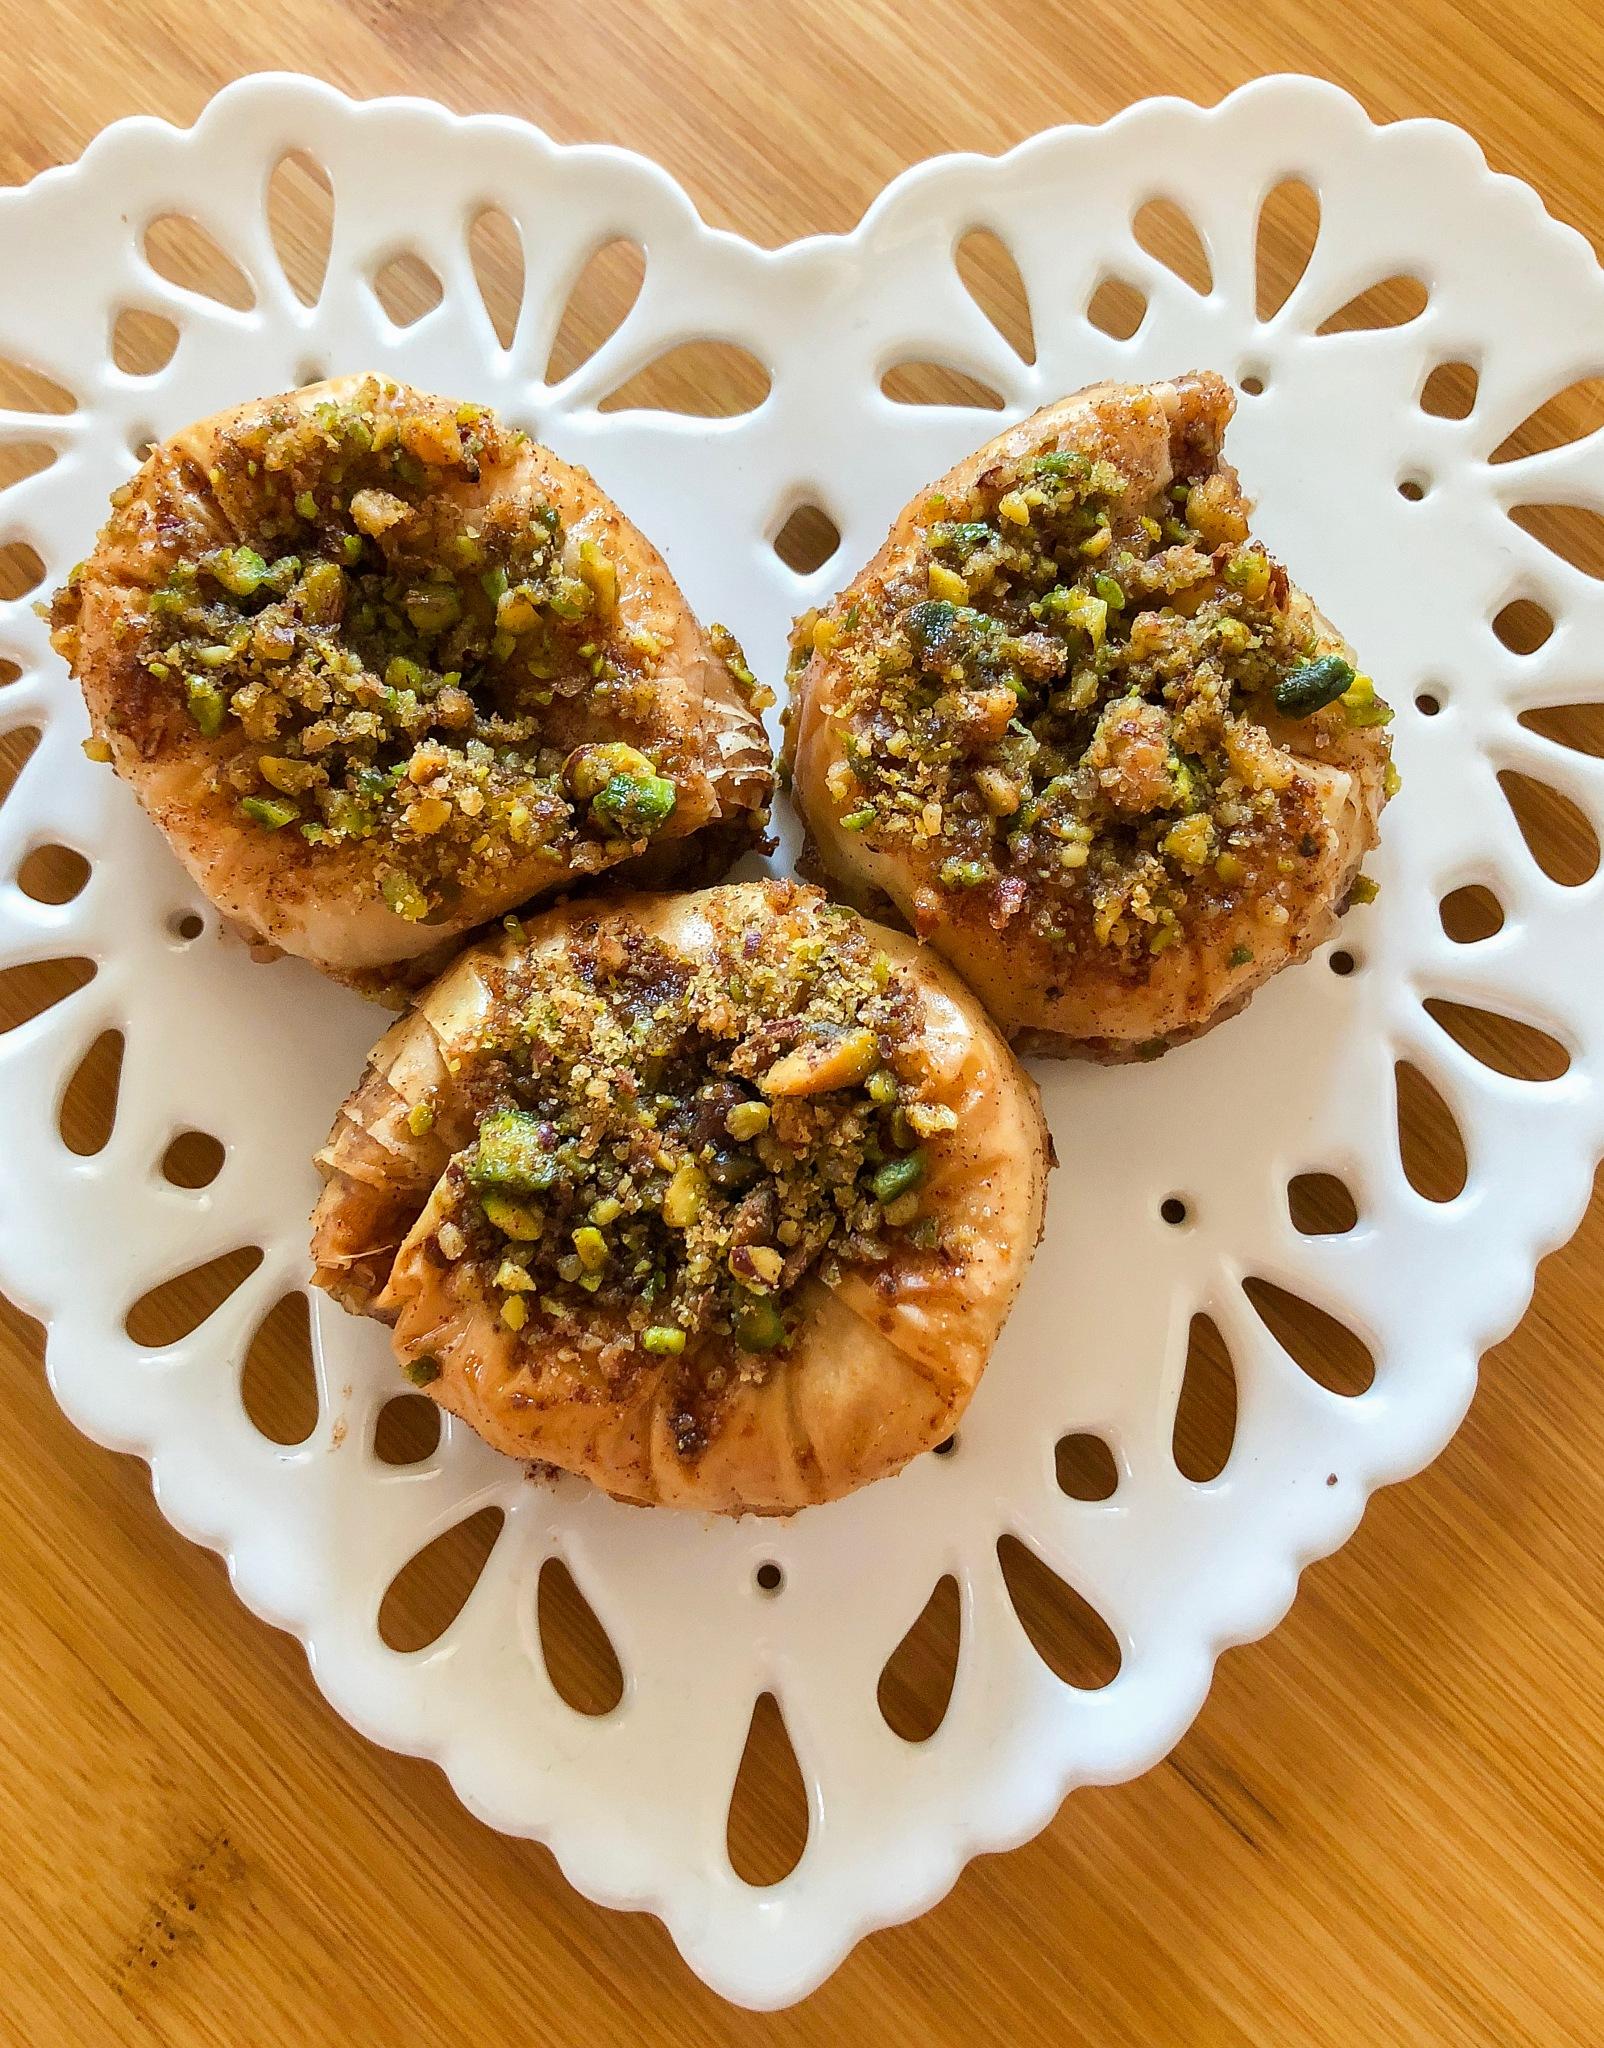 Pistachio Walnut Baklava by Suzie Ridler